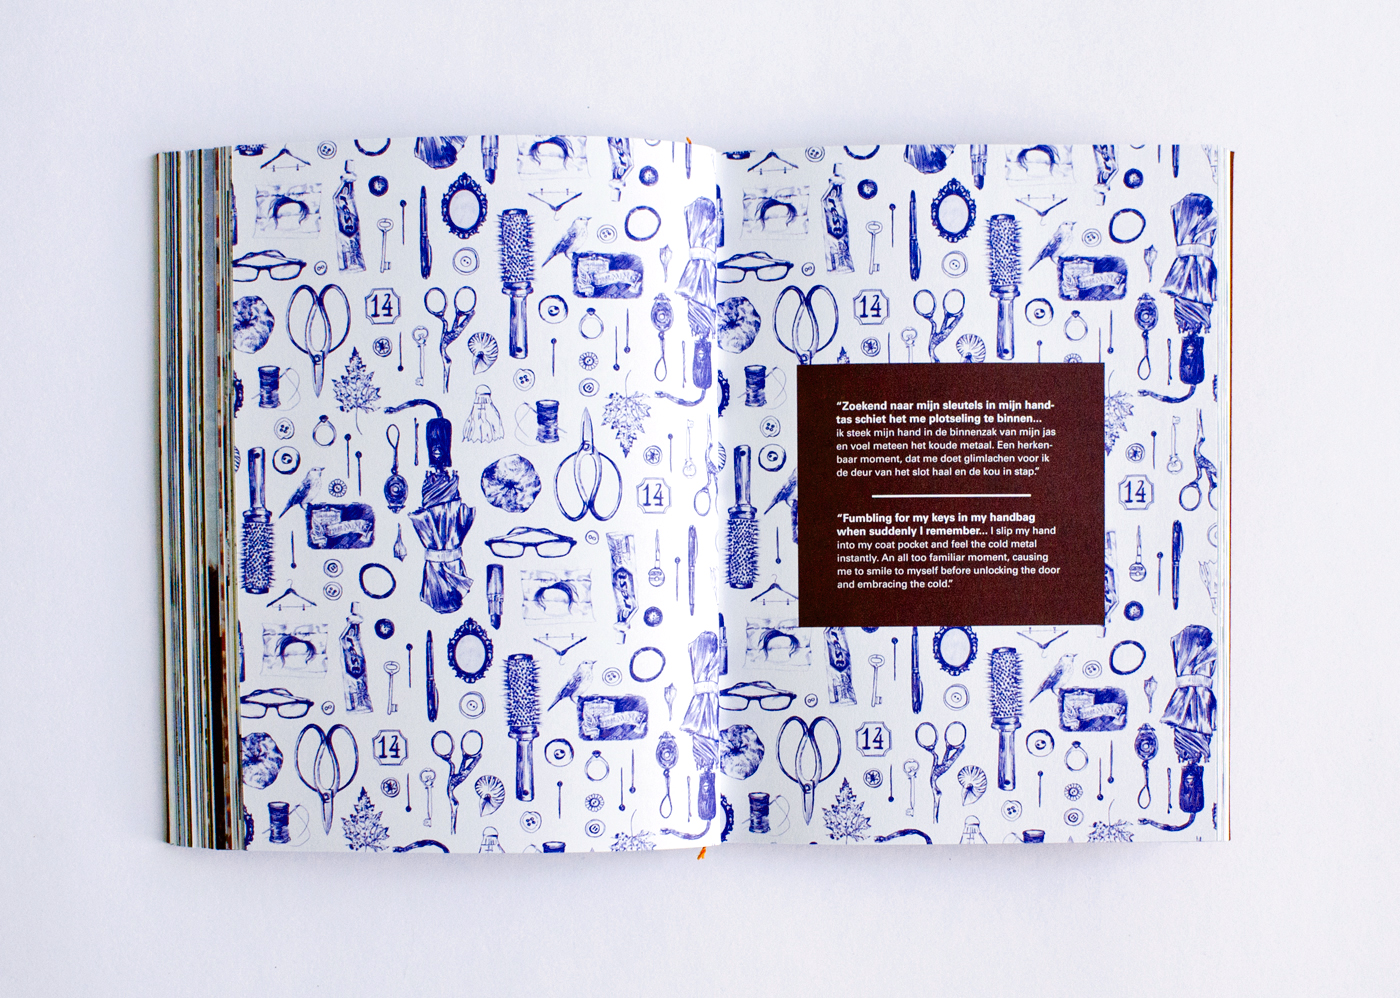 fig. 2. Pattern in Creenstone book